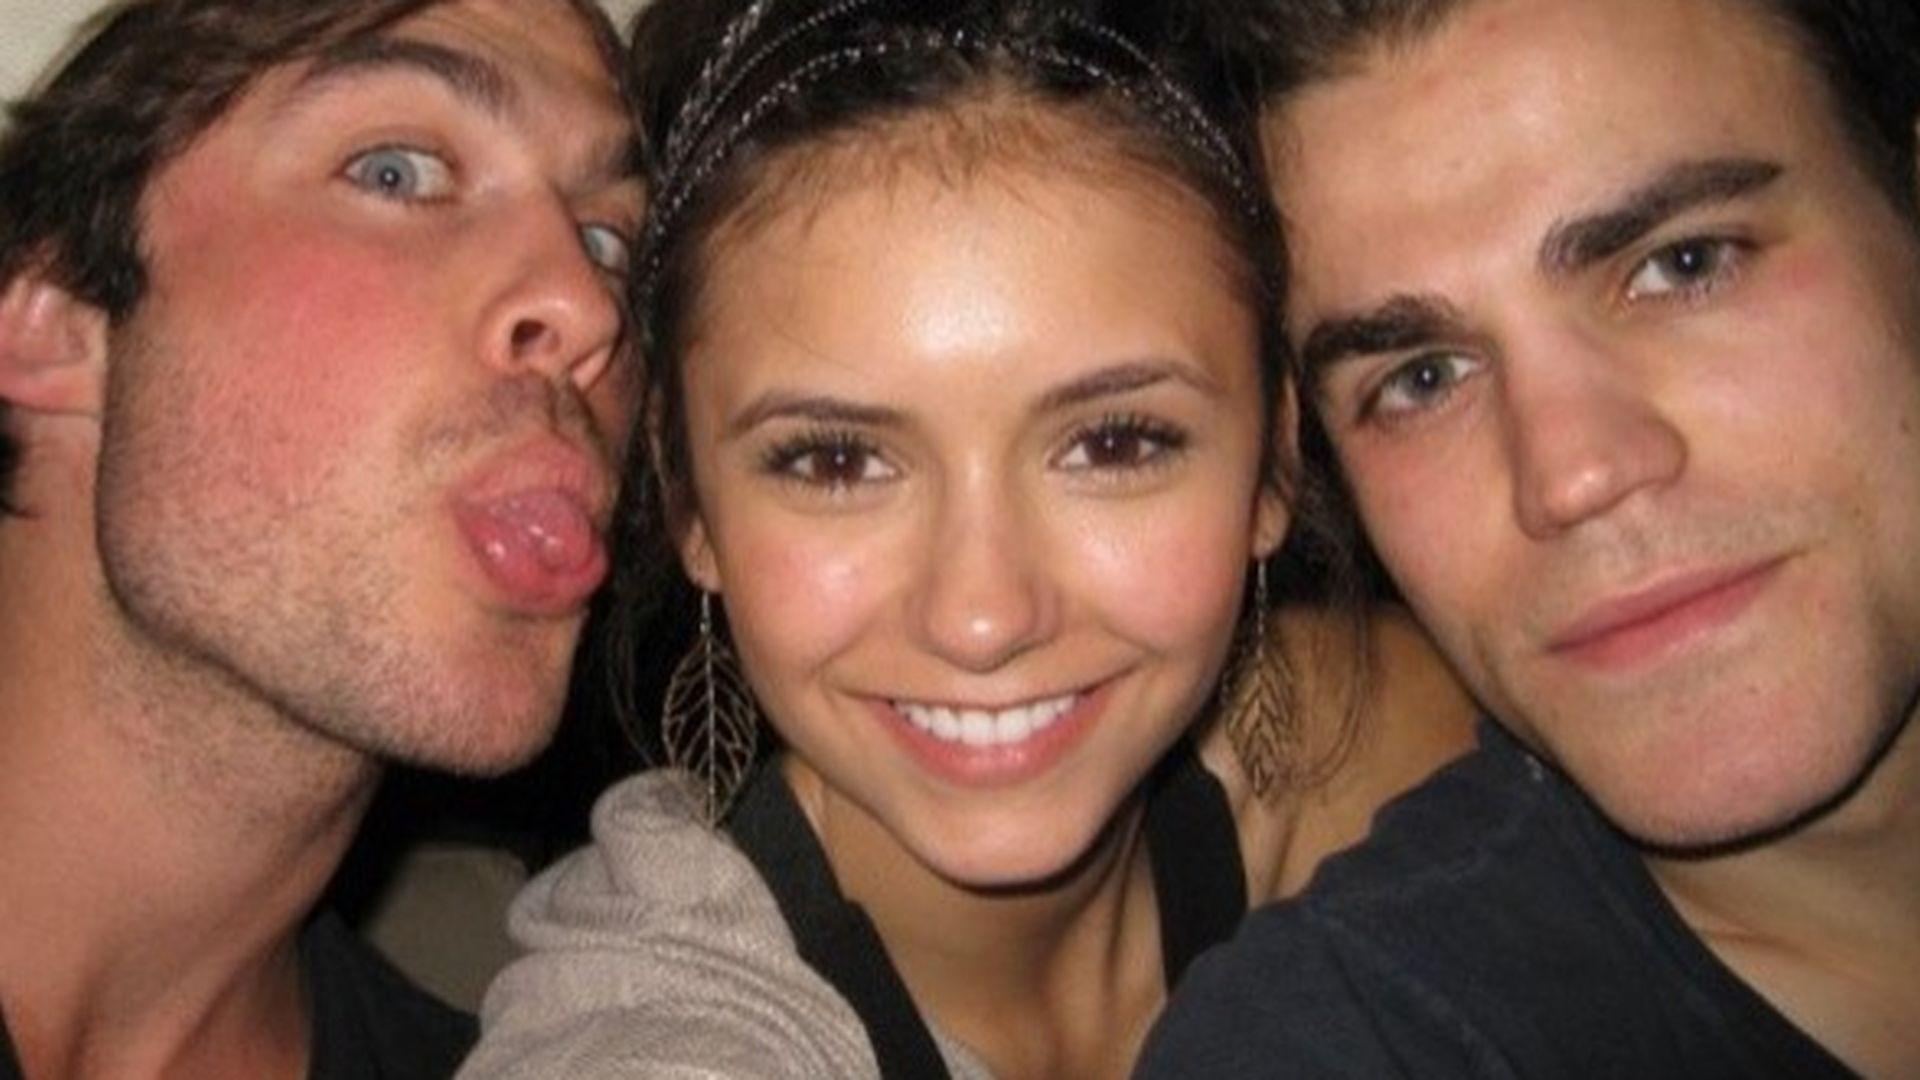 Michael trevino and nina dobrev dating 2014 5